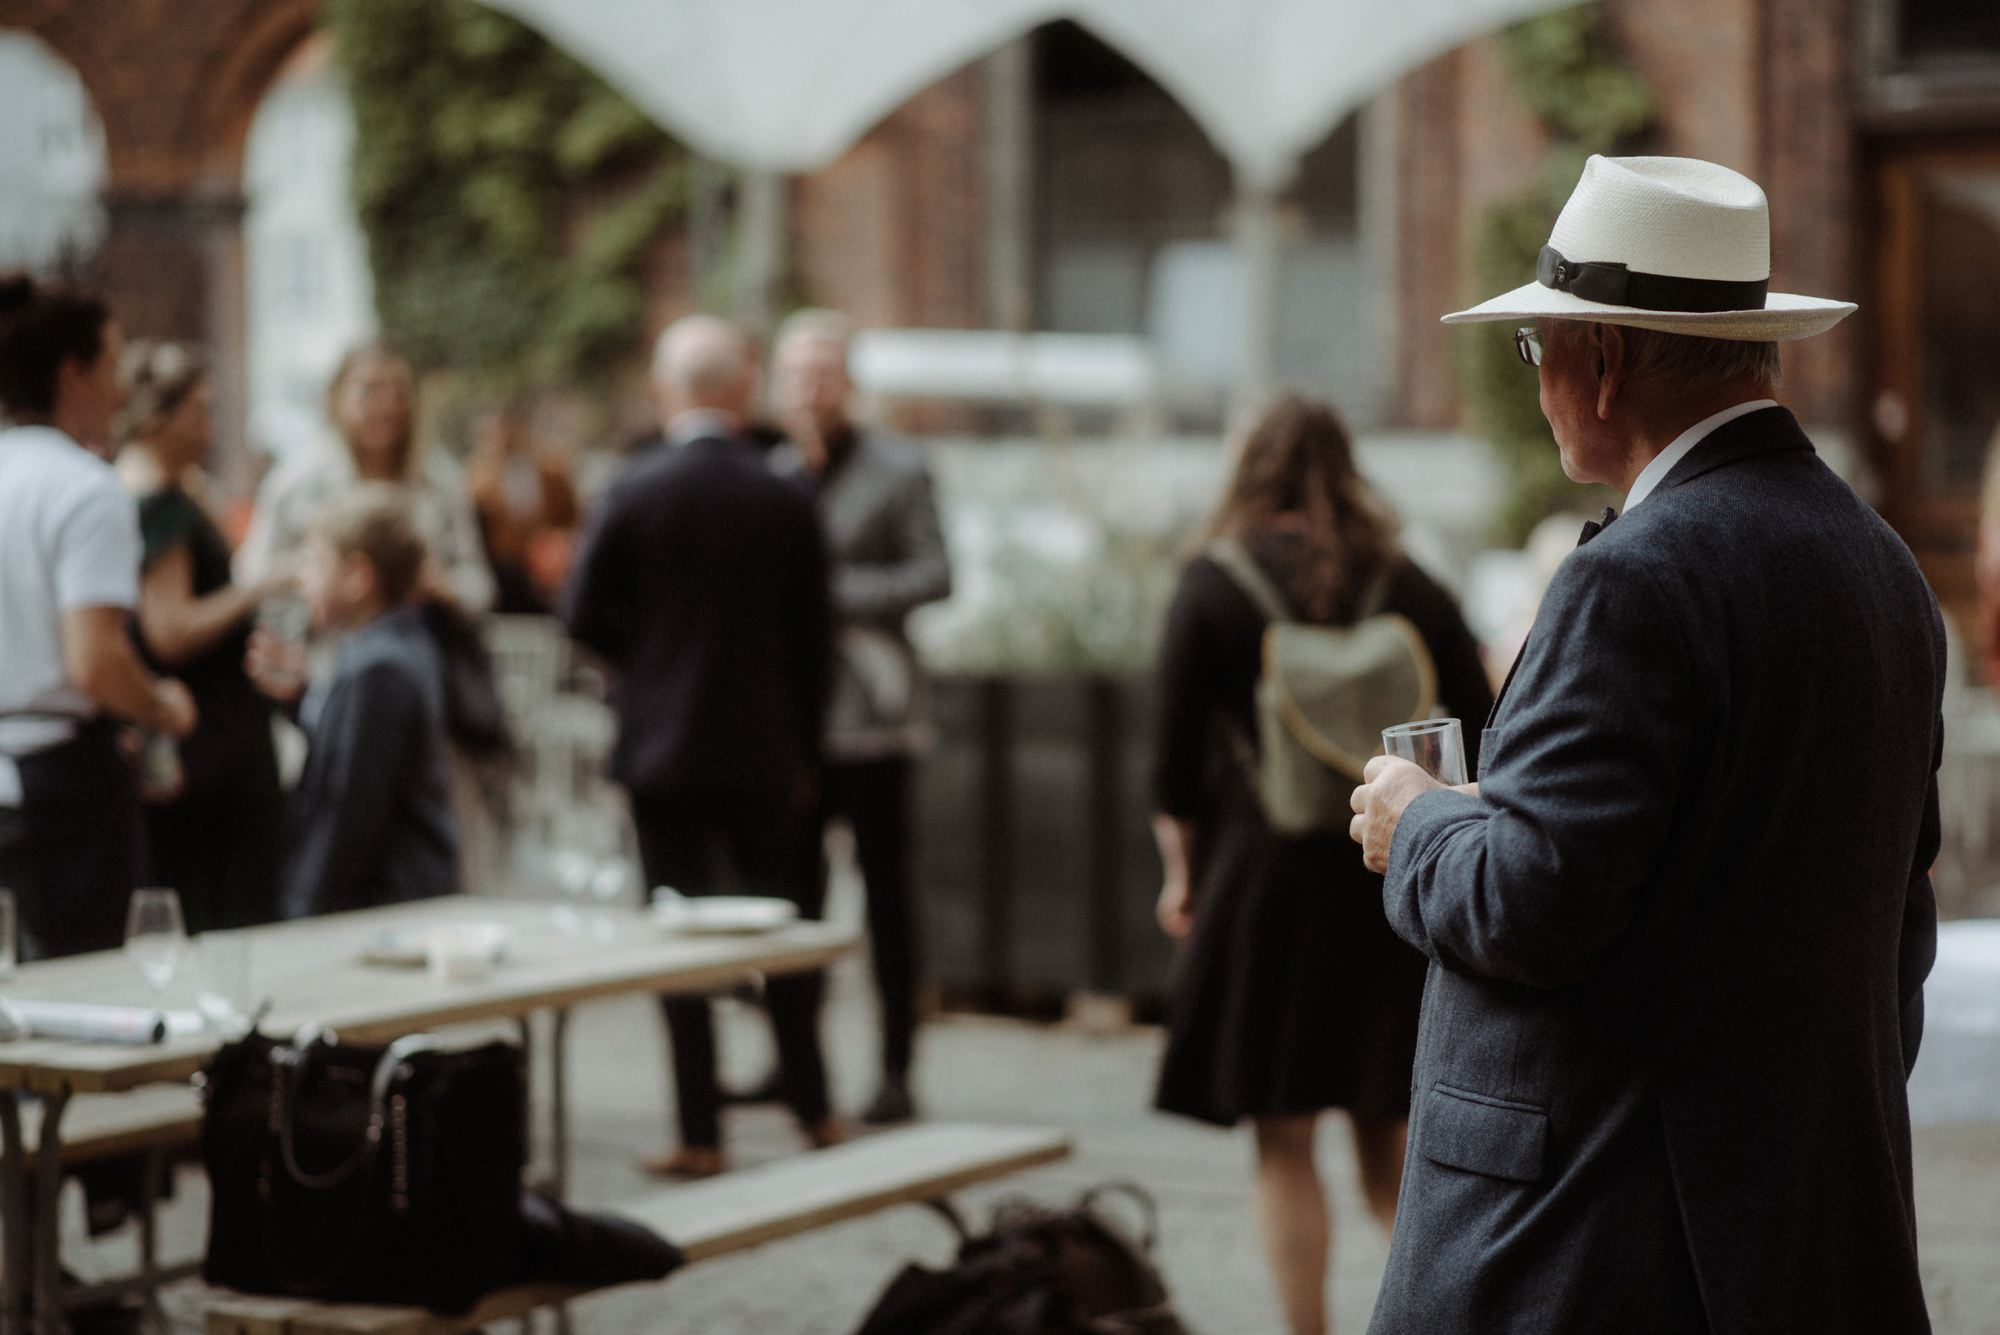 copenhagen wedding photography 0047 1